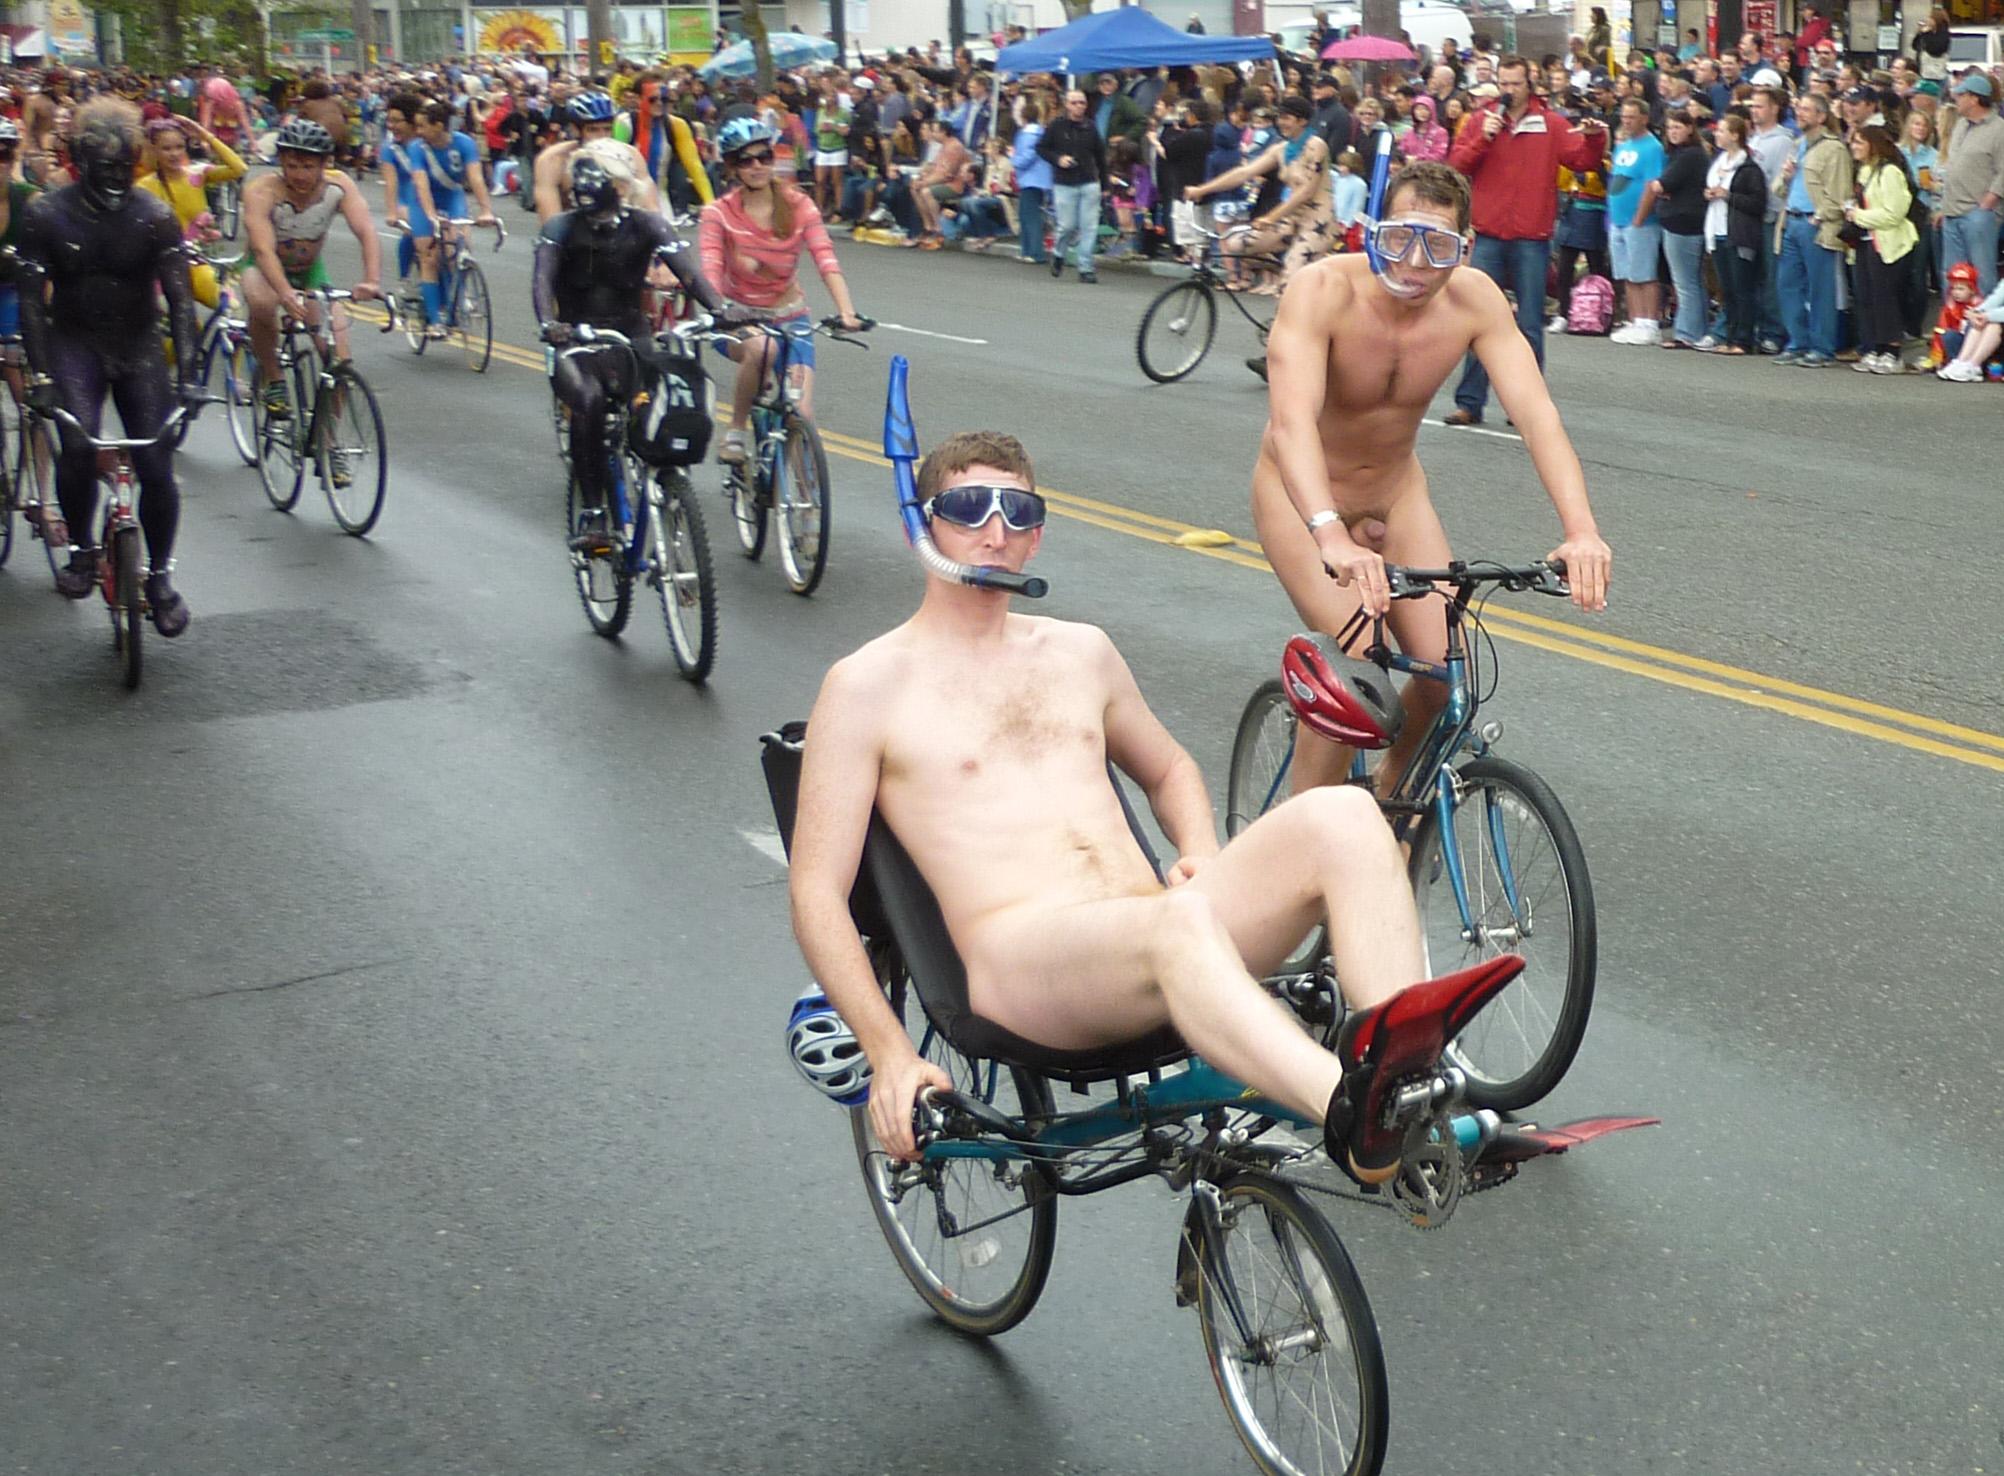 bikers get naked